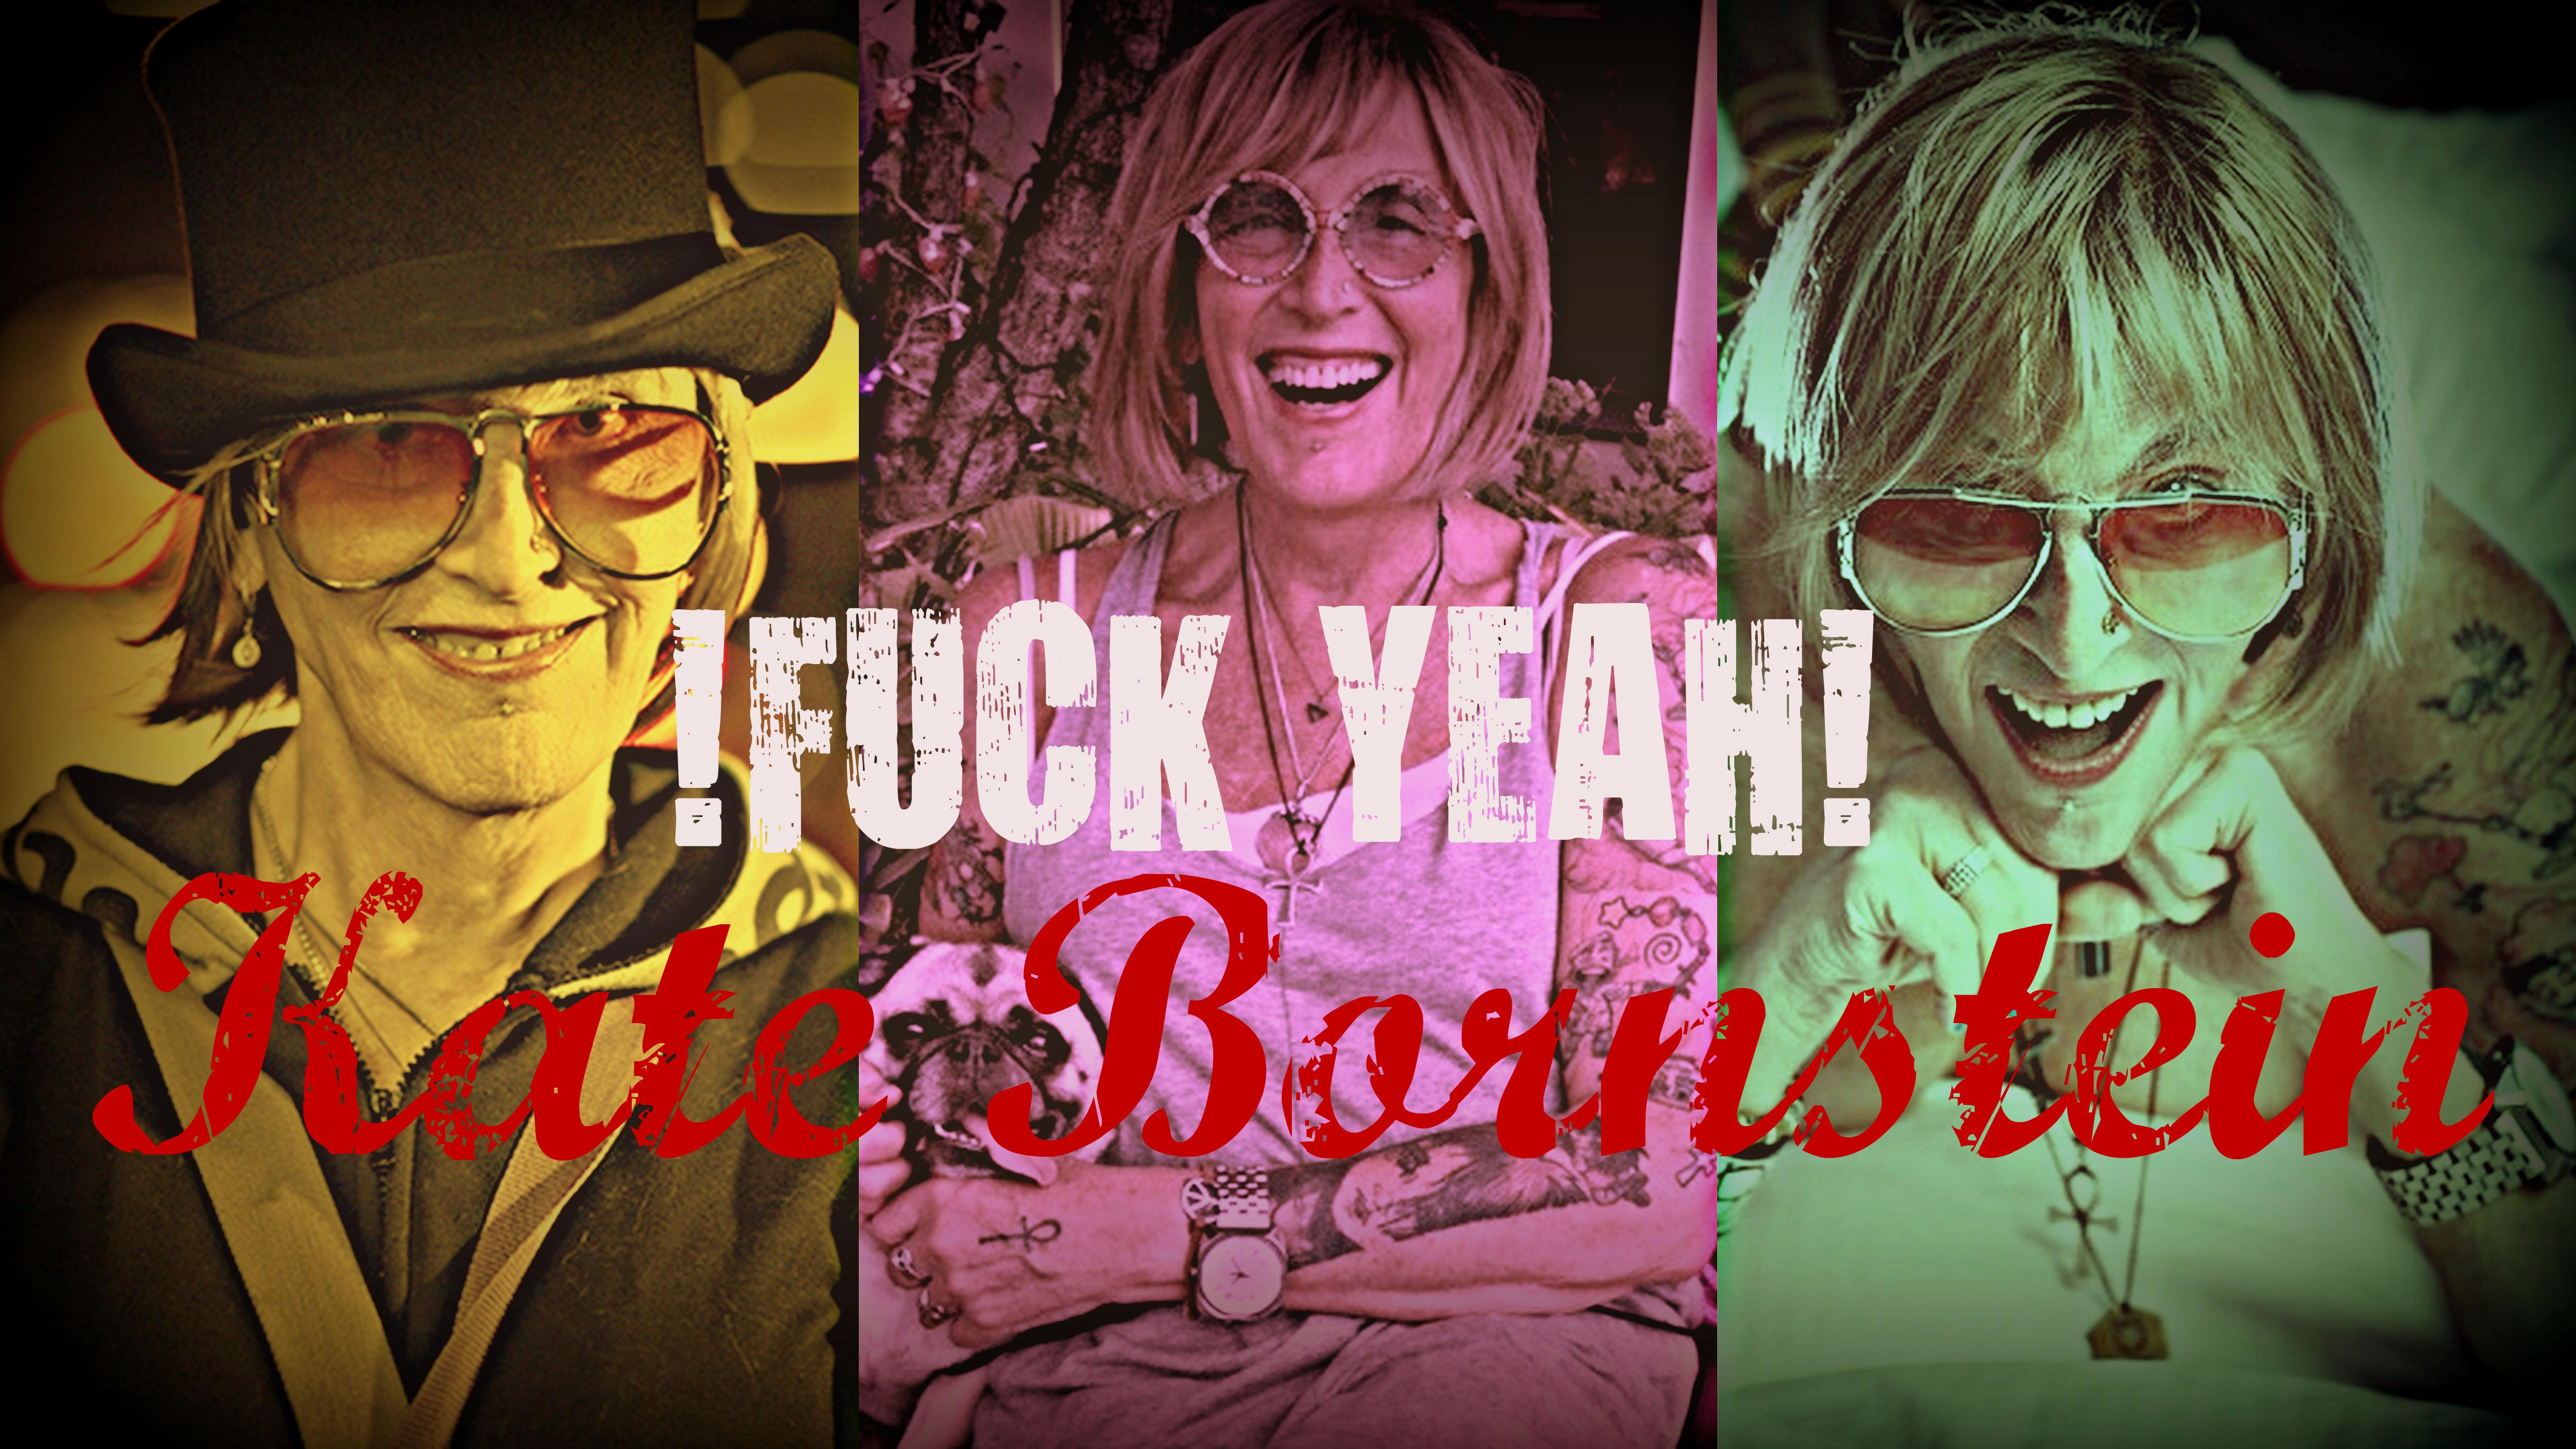 Fuck Yeah Kate Bornstein!